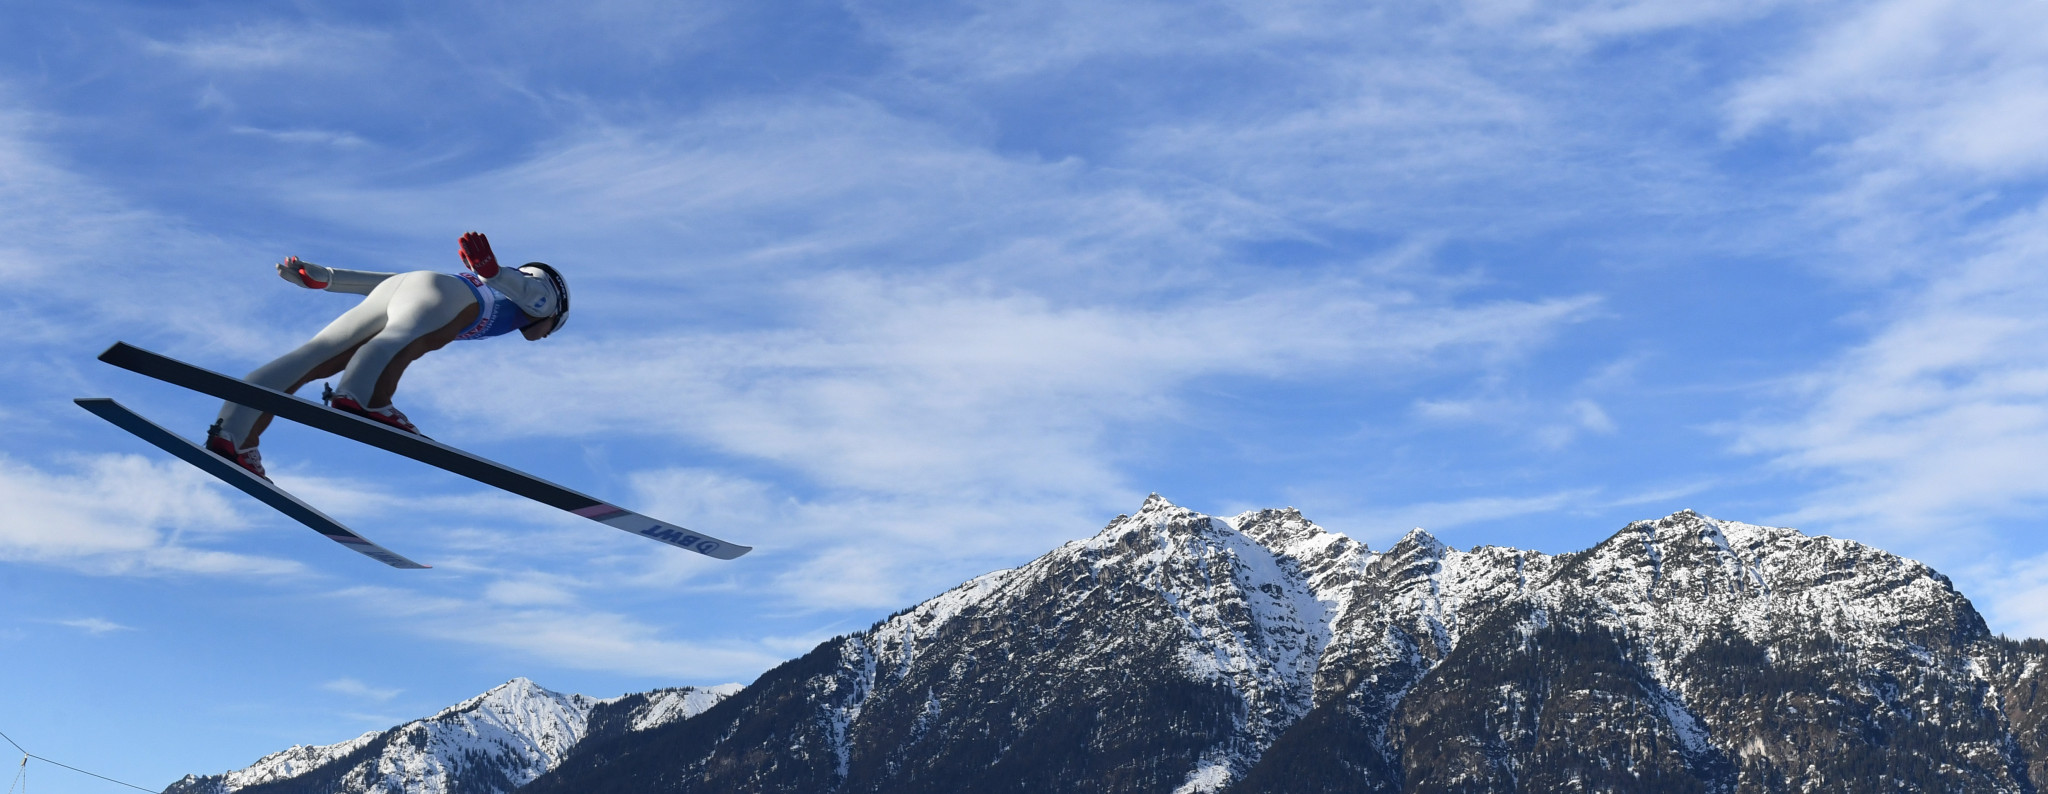 Forfang tops qualification ahead of Four Hills event in Garmisch-Partenkirchen